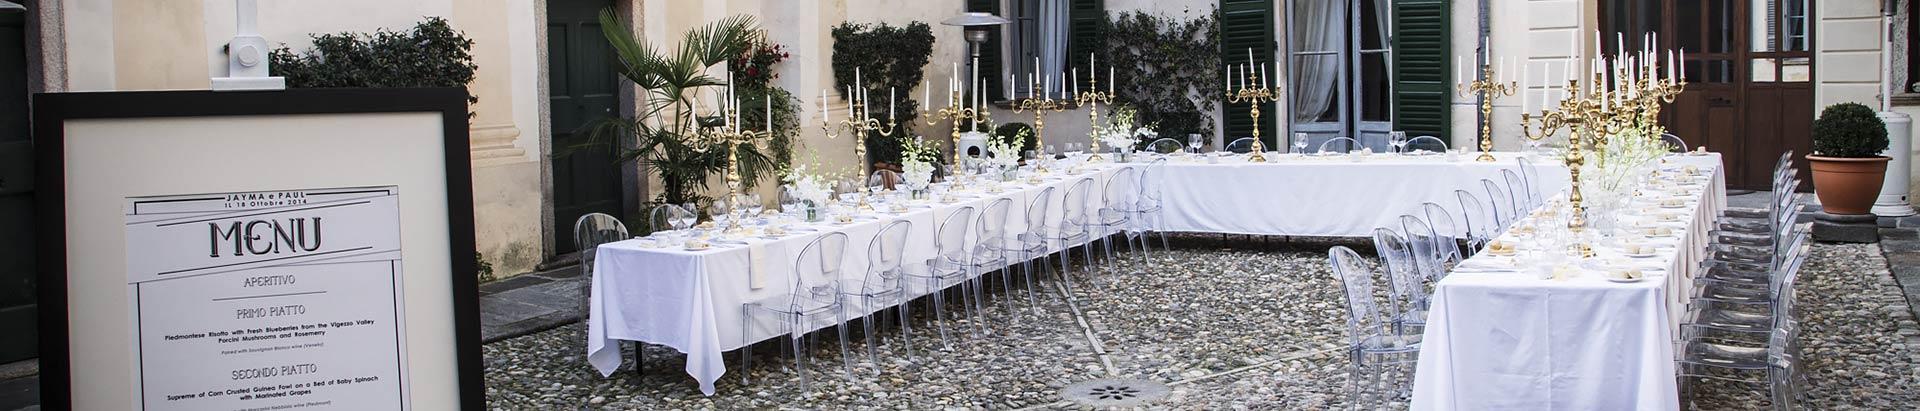 ricevimento-matrimonio-palazzo-gemelli